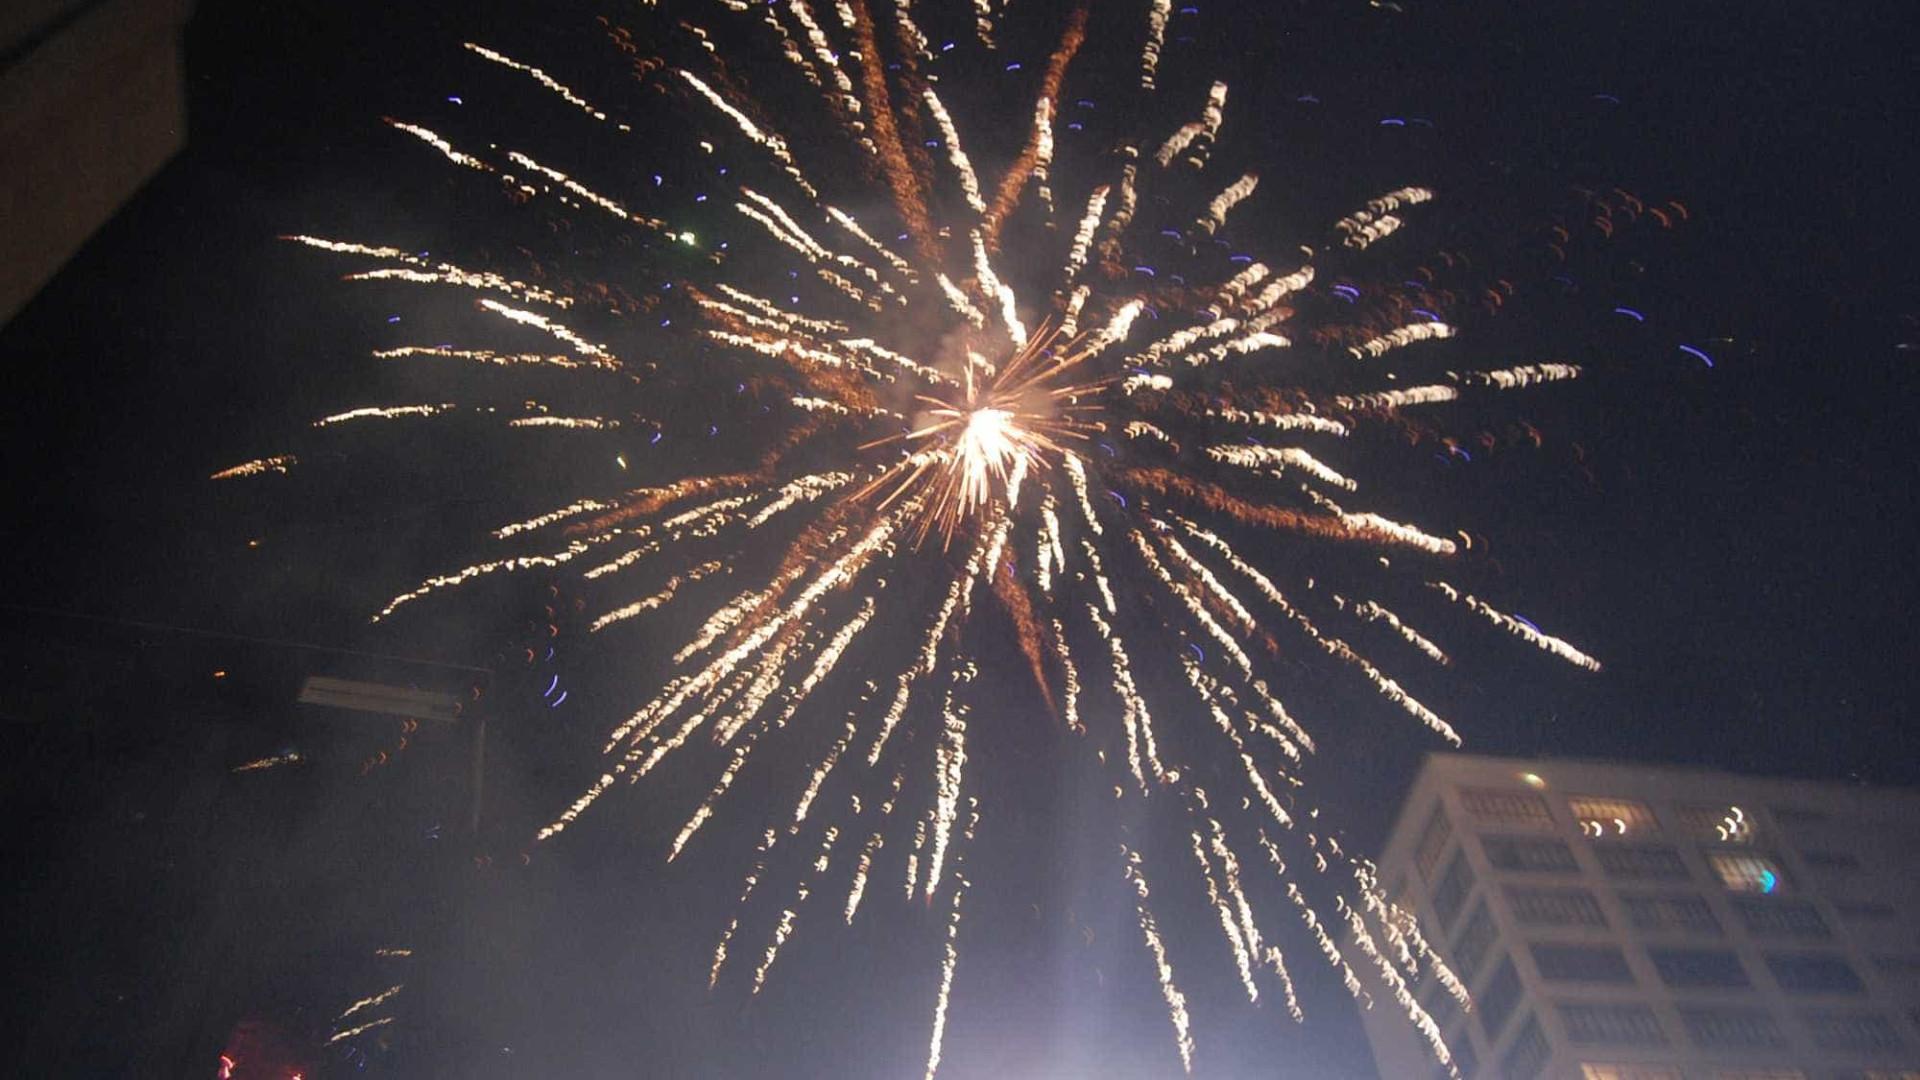 Réveillon na Paulista tem festa com fogos 'silenciosos' pouco notados